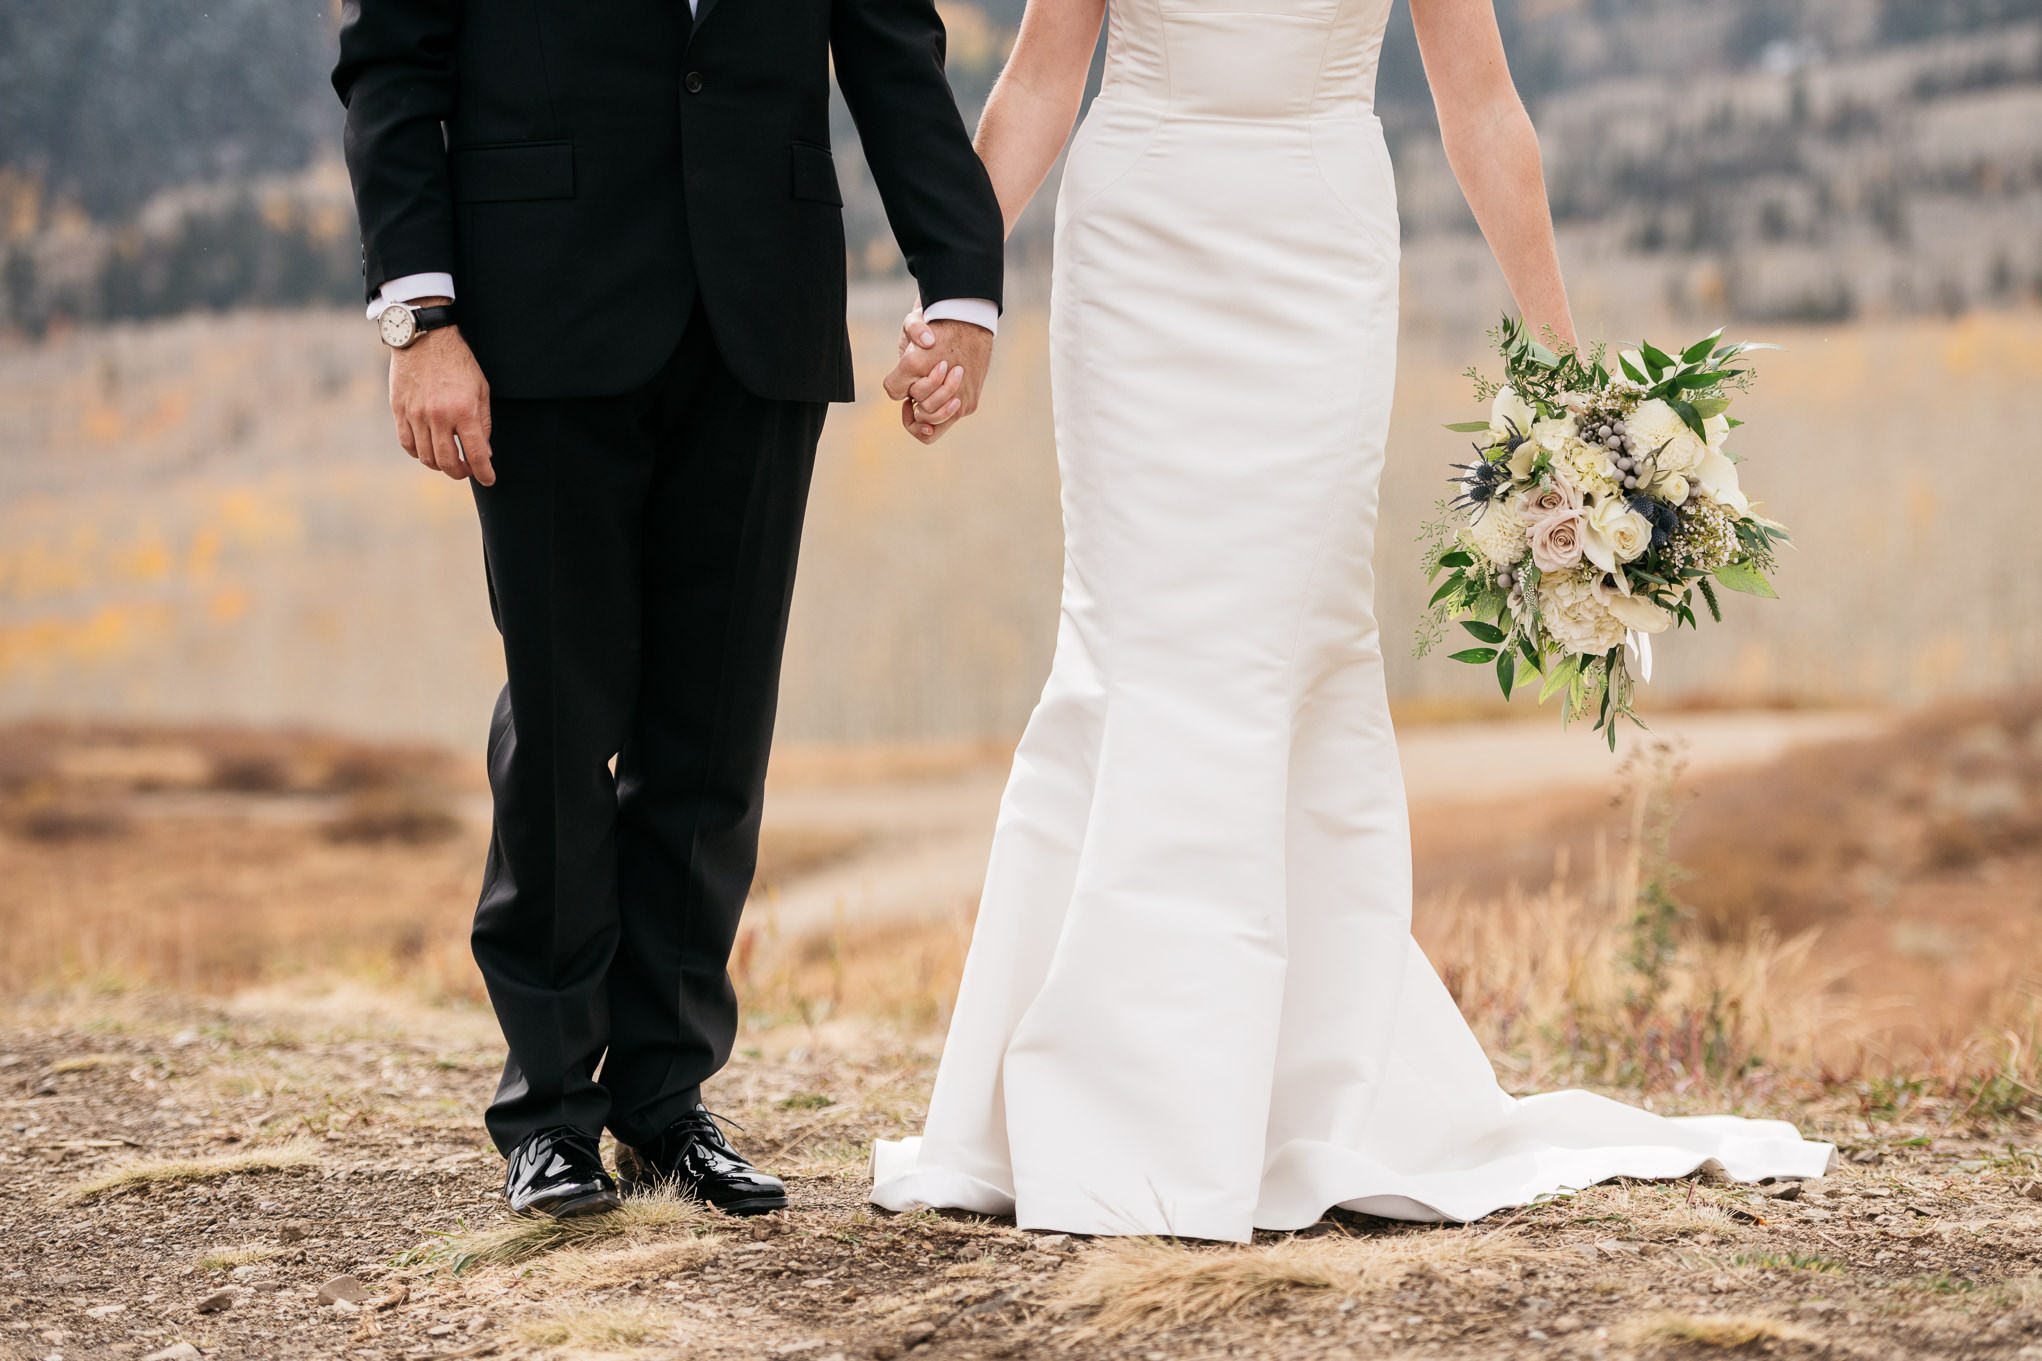 182_ONL_Mairin_Brian_Wedding_Trevor_Hooper_Photo.jpg